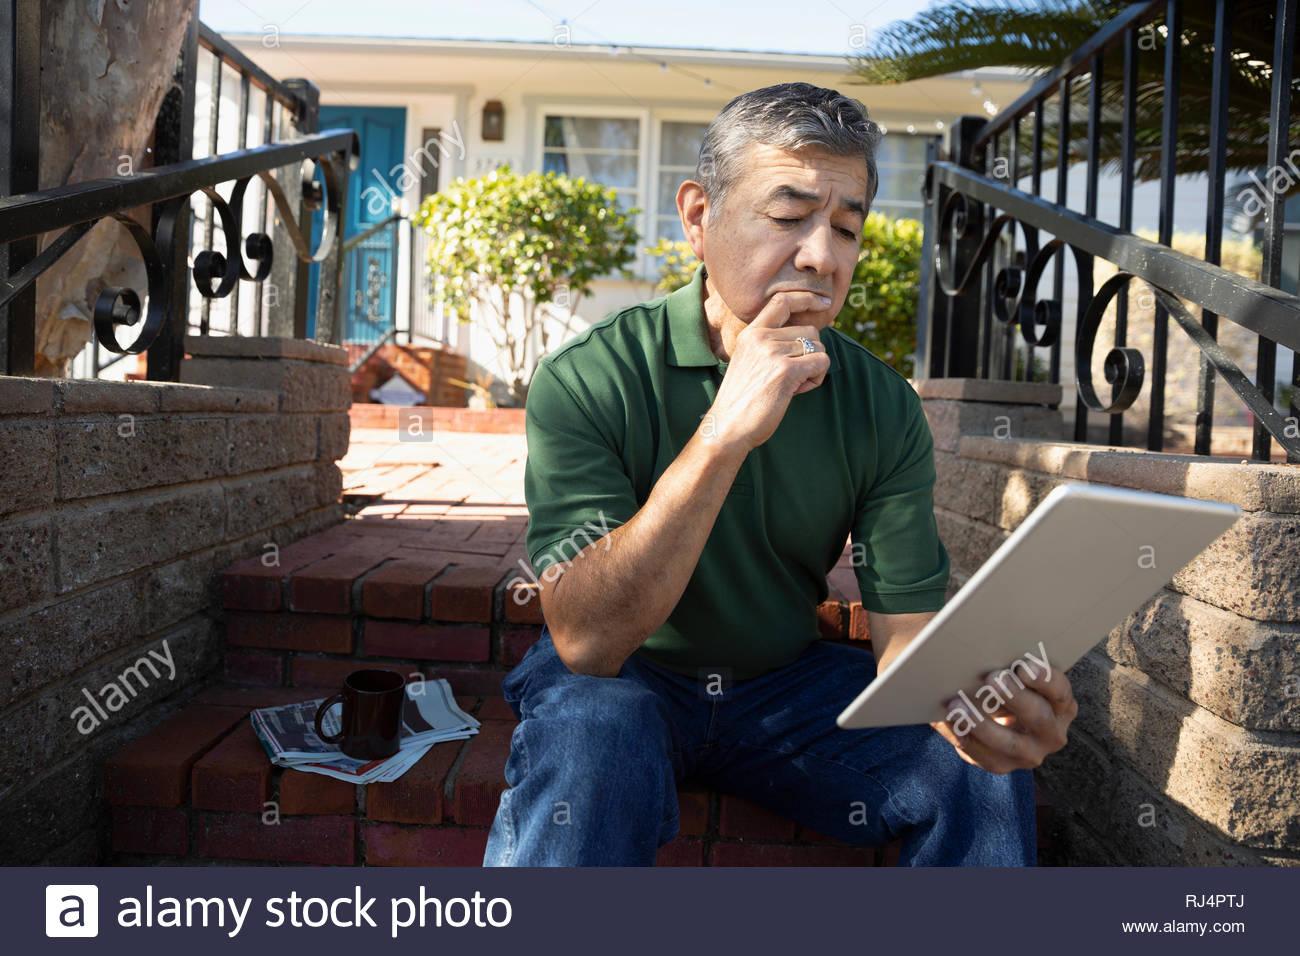 Latinx senior man using digital tablet on front stoop - Stock Image